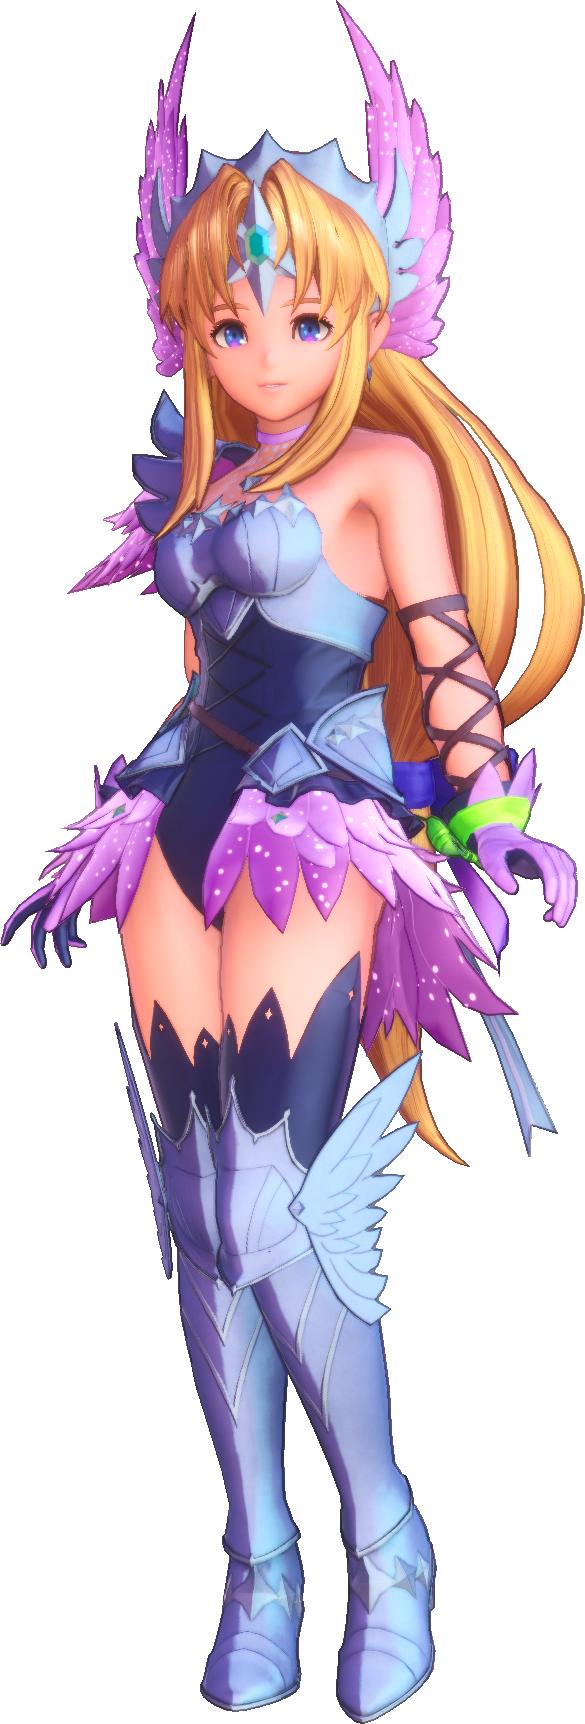 Starlancer (Trials of Mana)